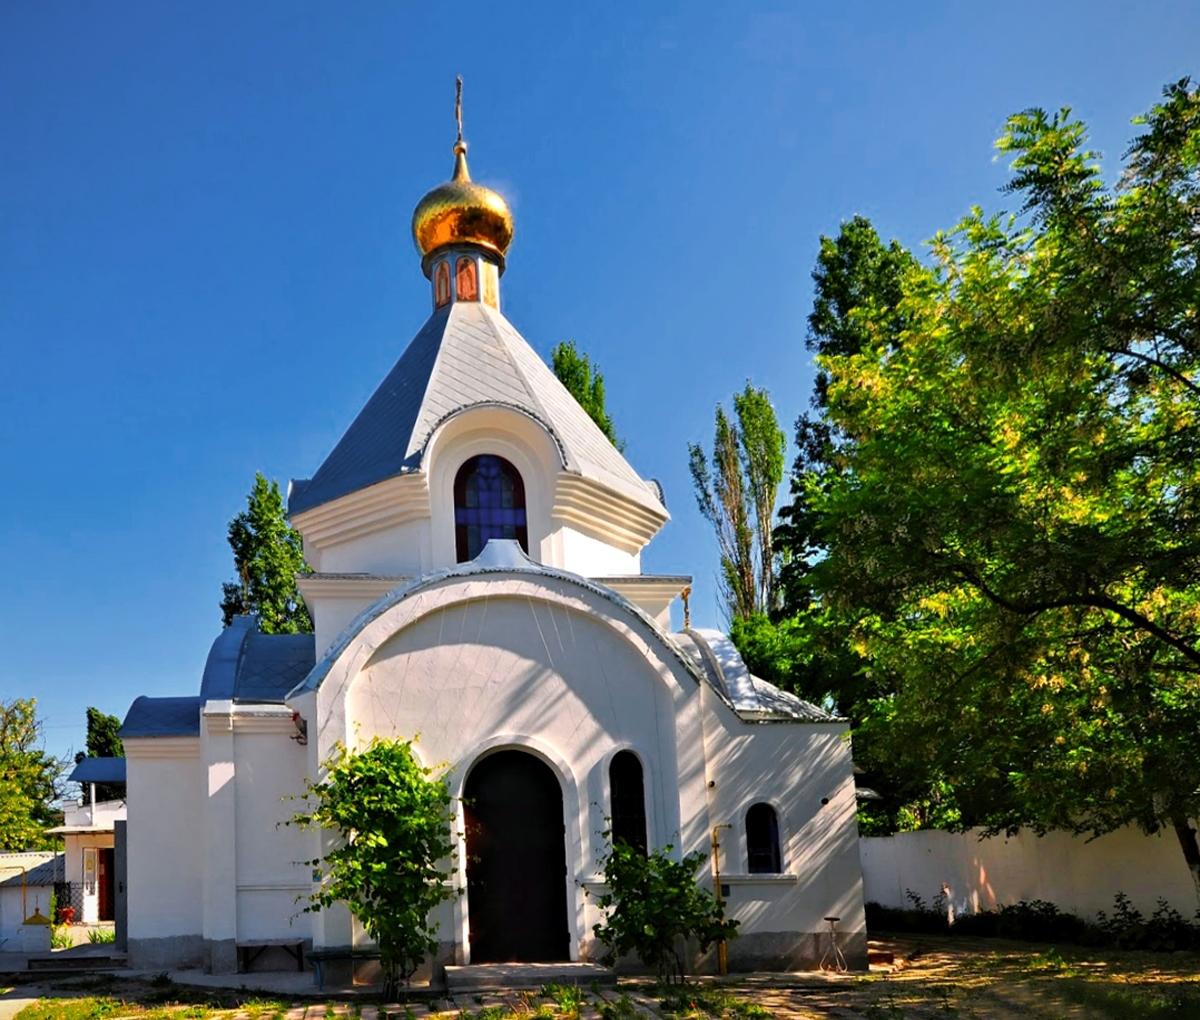 00 St Semyon Cathedral. Nikolayev. 16.08.14